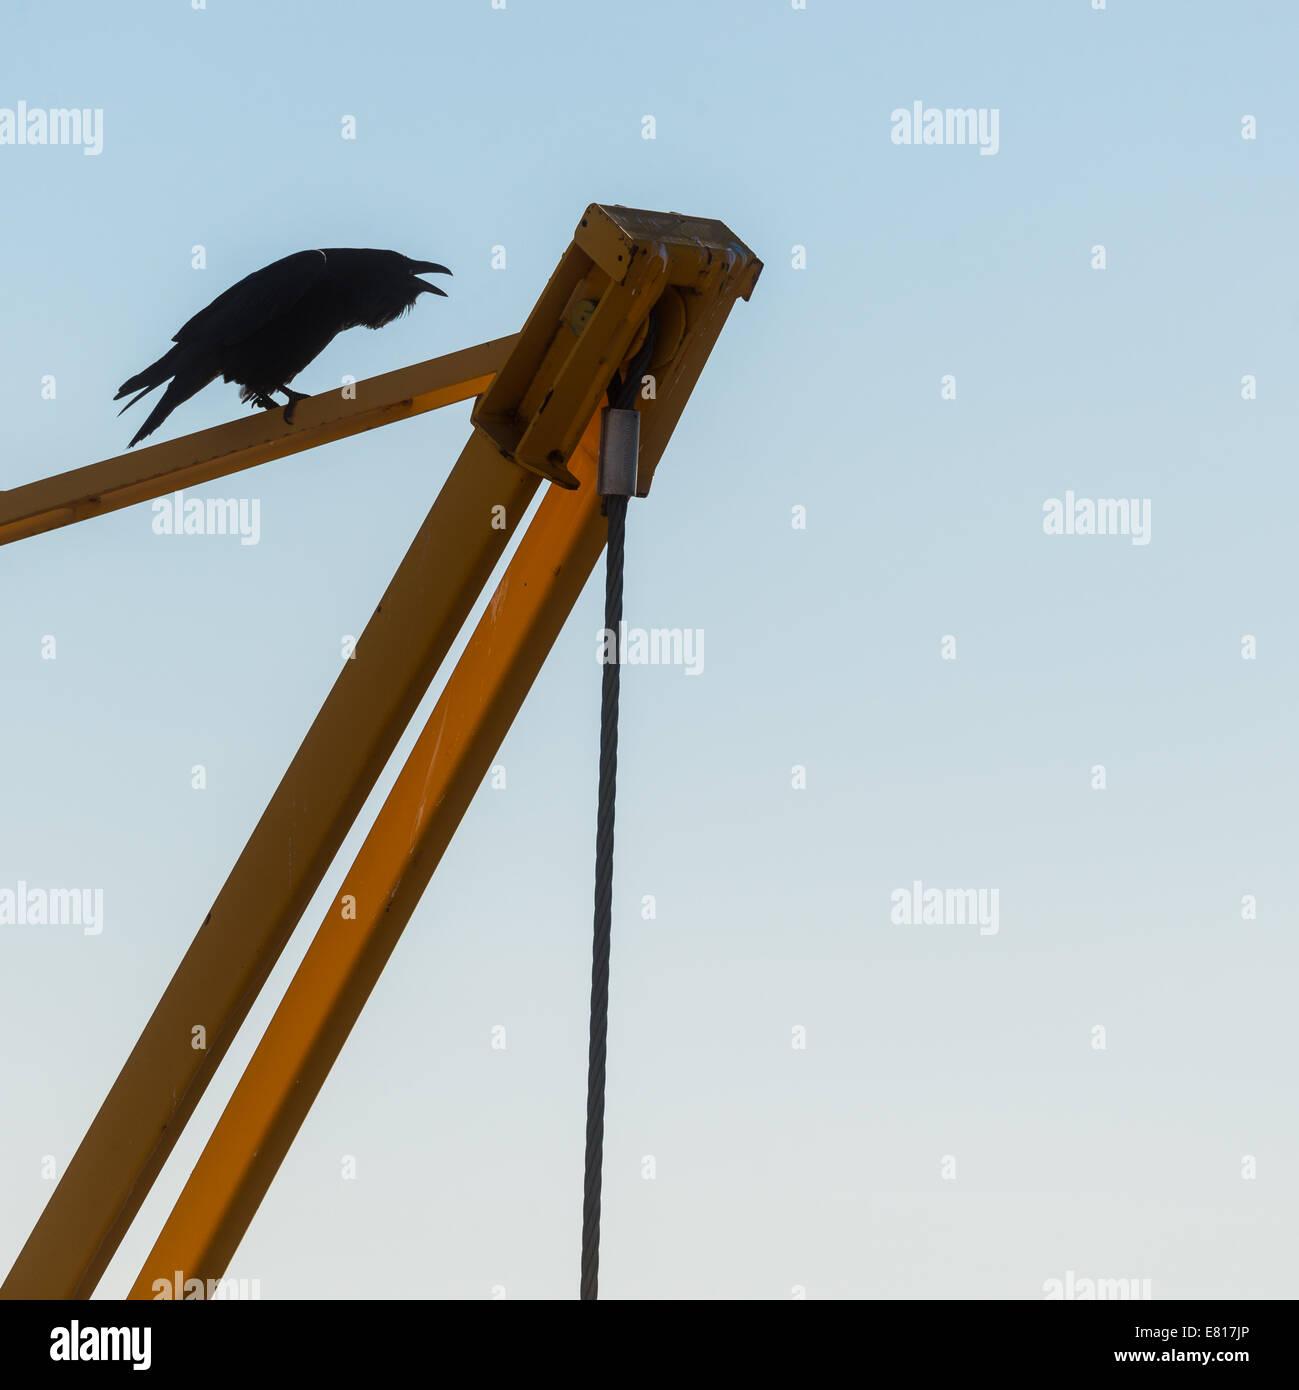 Black Raven perched atop a yellow construction crane - Stock Image